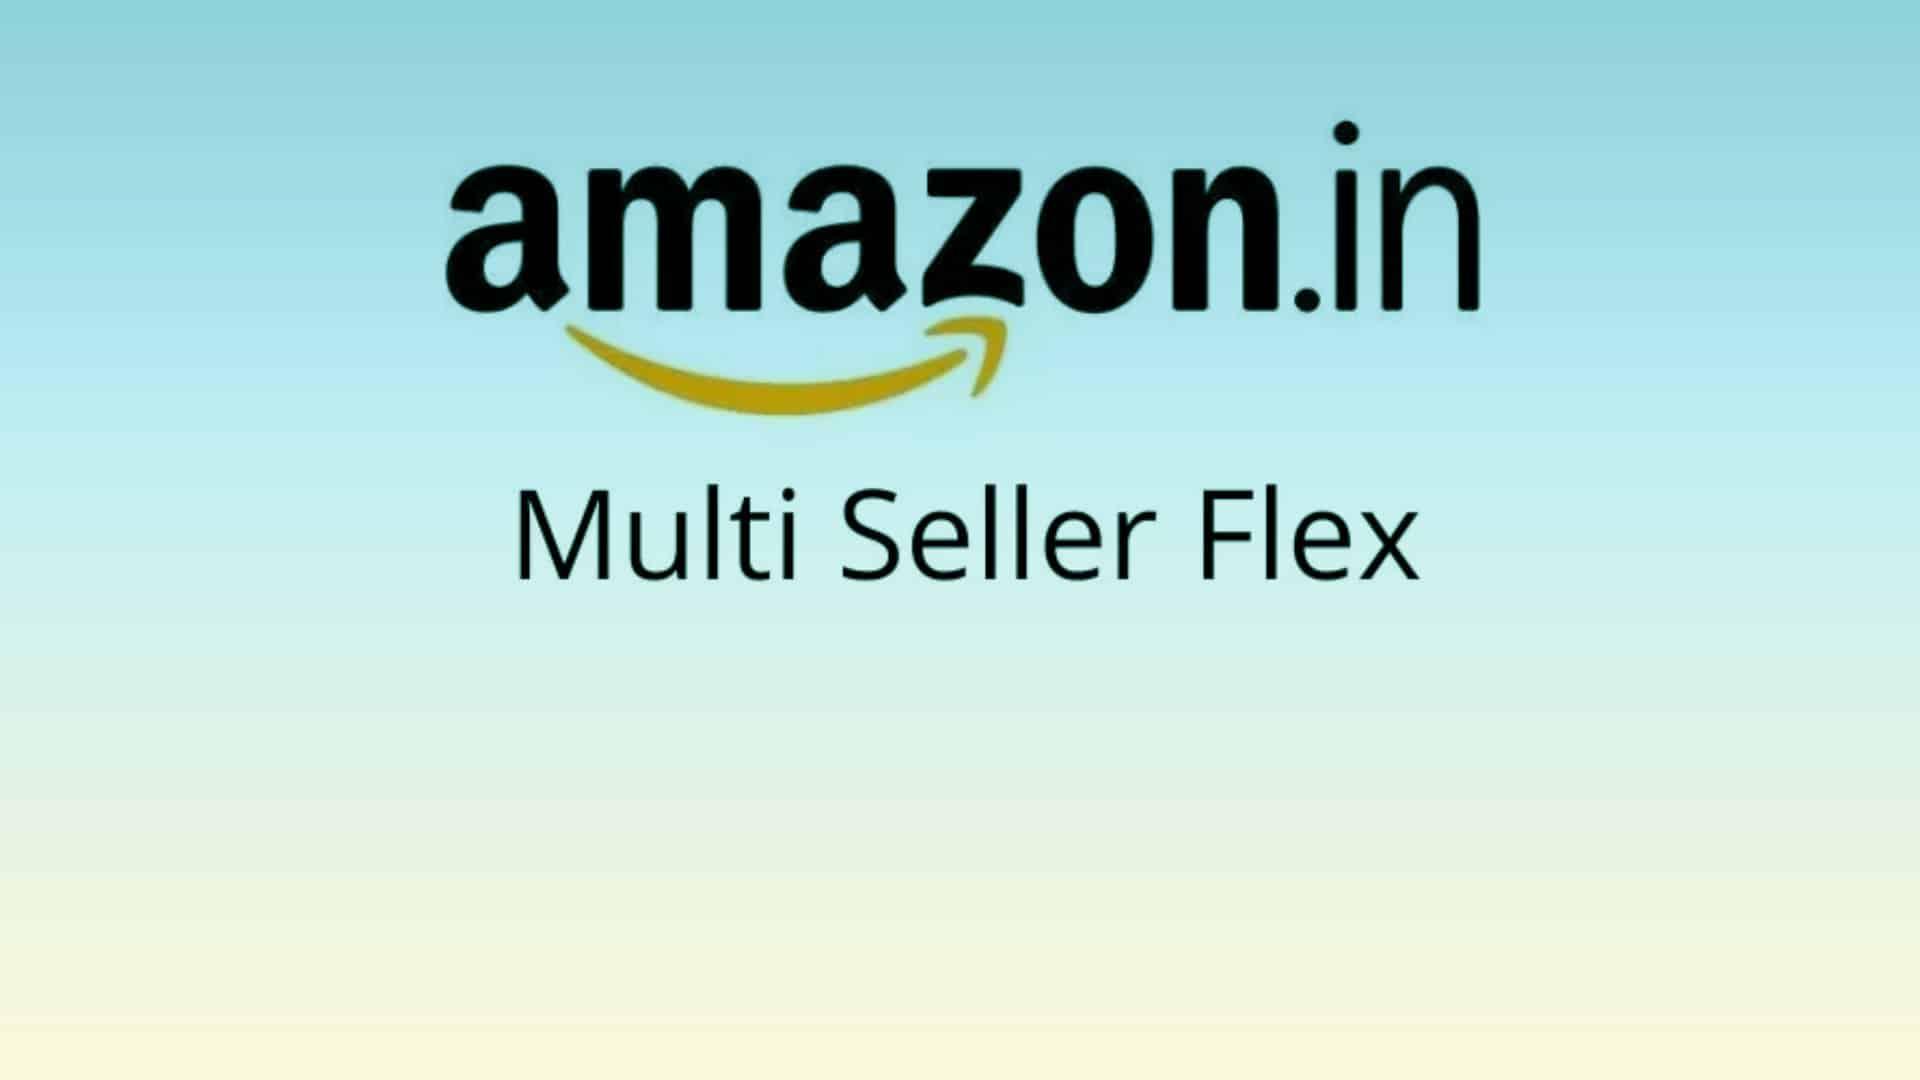 Amazon India launches 'Multi-Seller Flex'